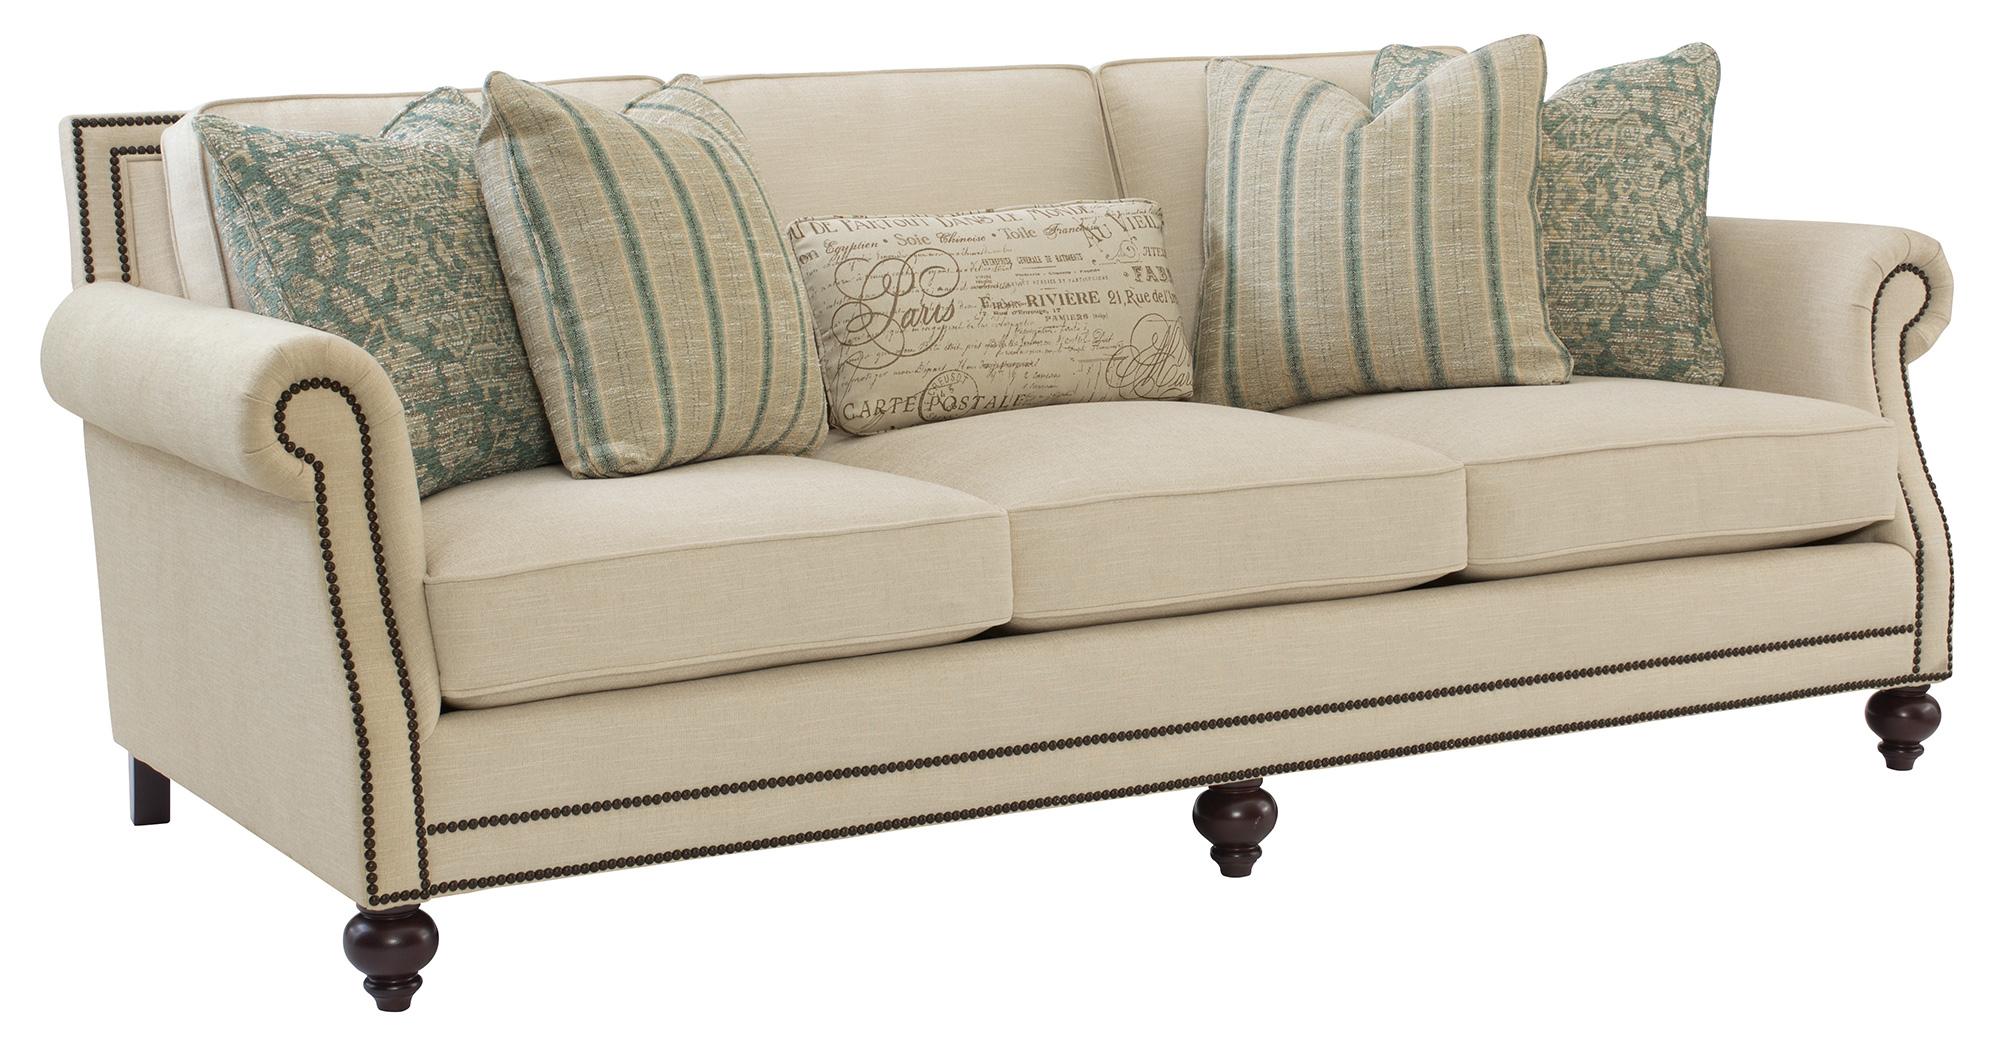 bernhardt sofa price list broyhill green plaid hospitality